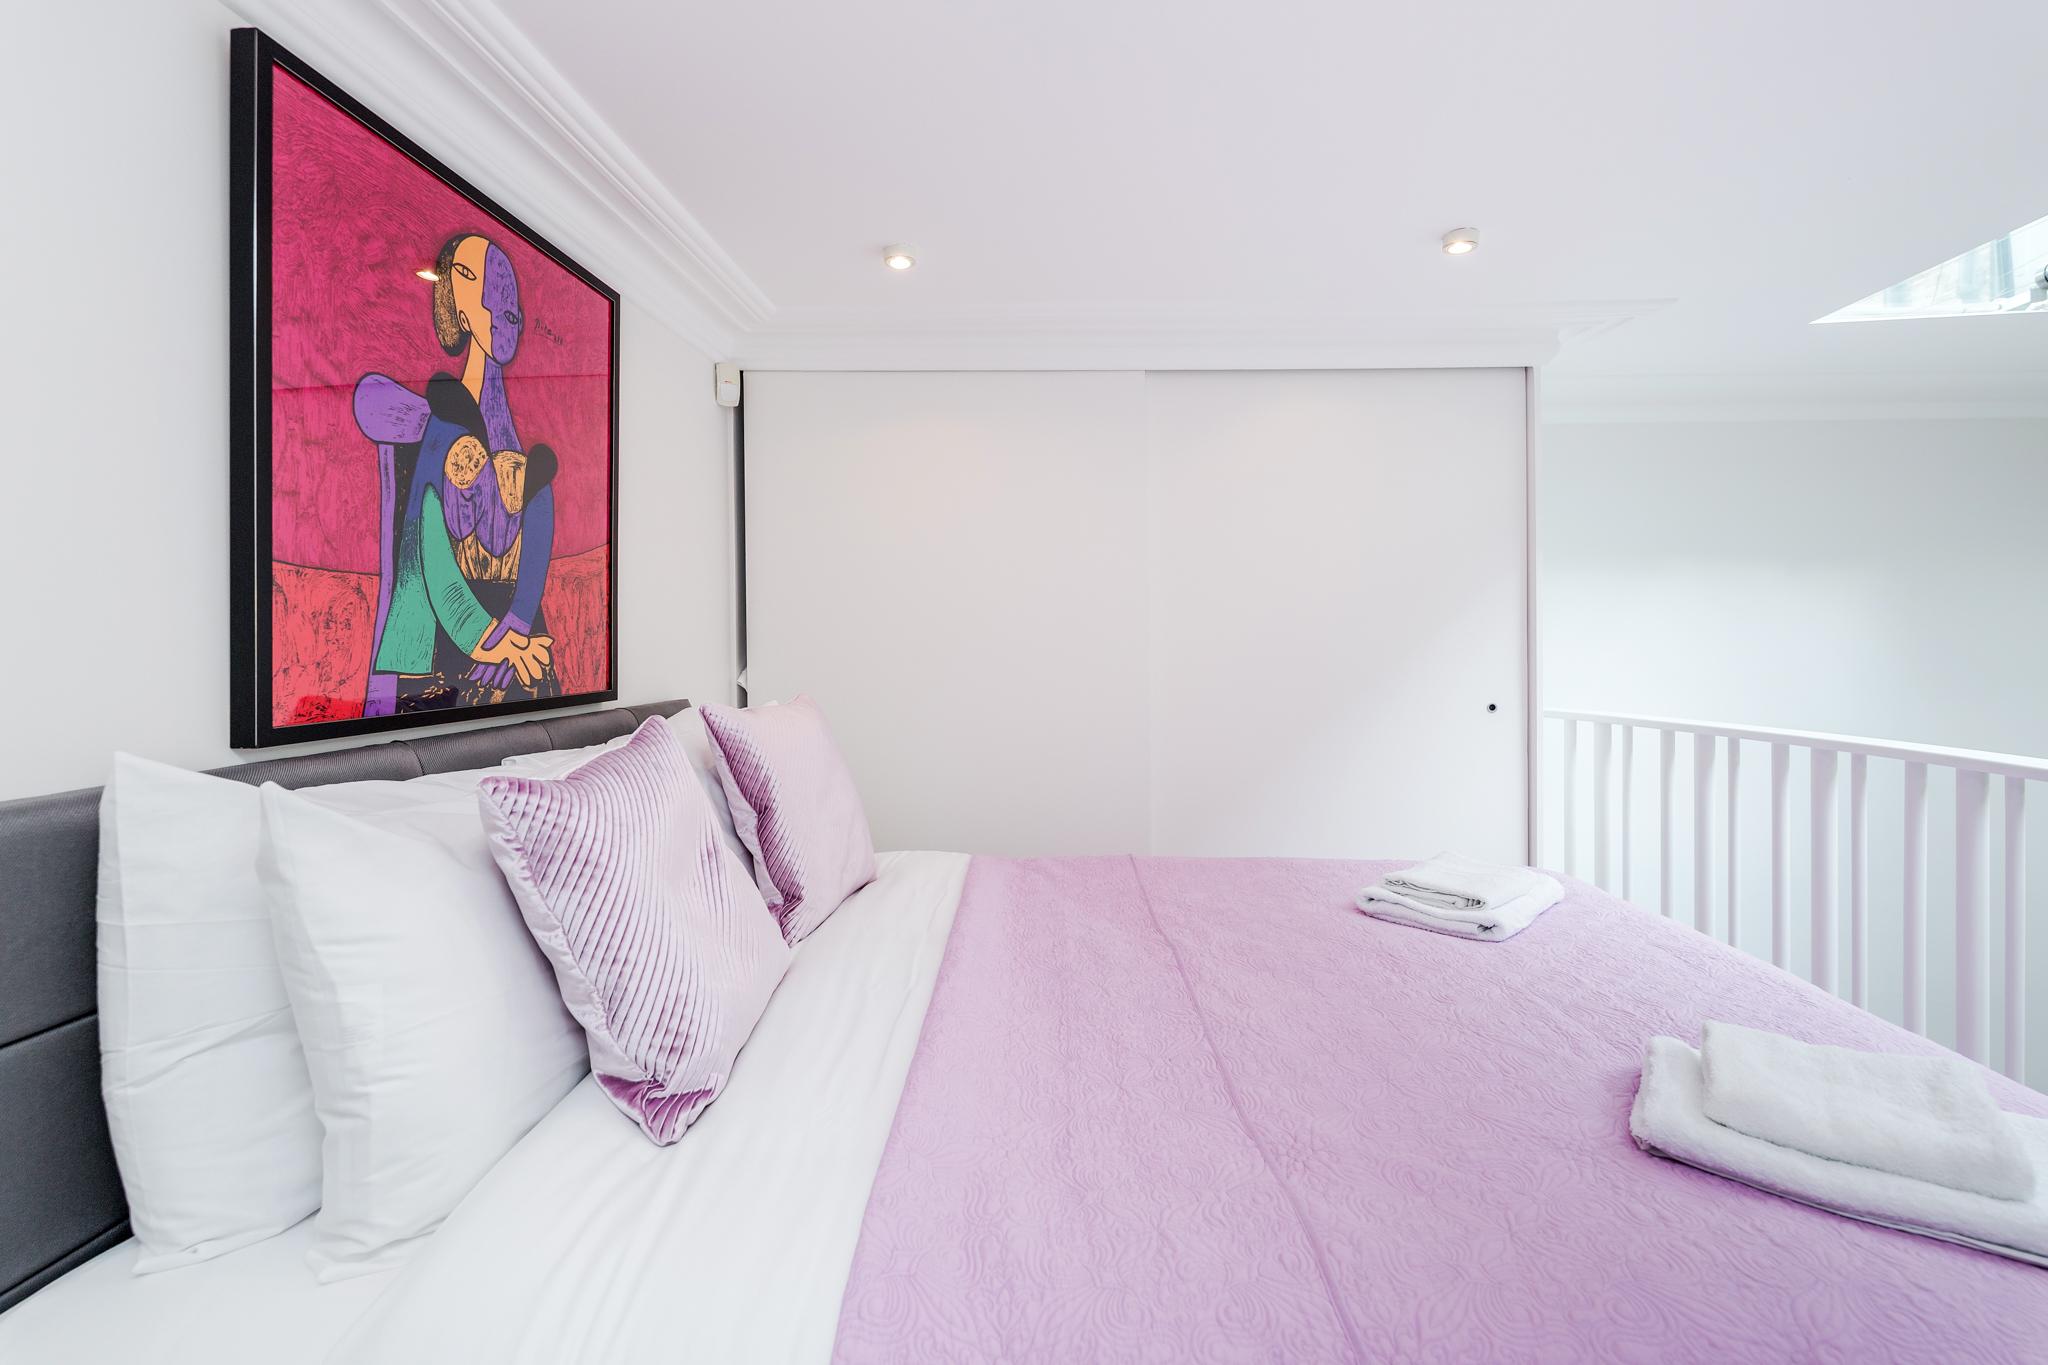 Apartment Distinctive Kensington apt for 3 with Mezzanine photo 23290236